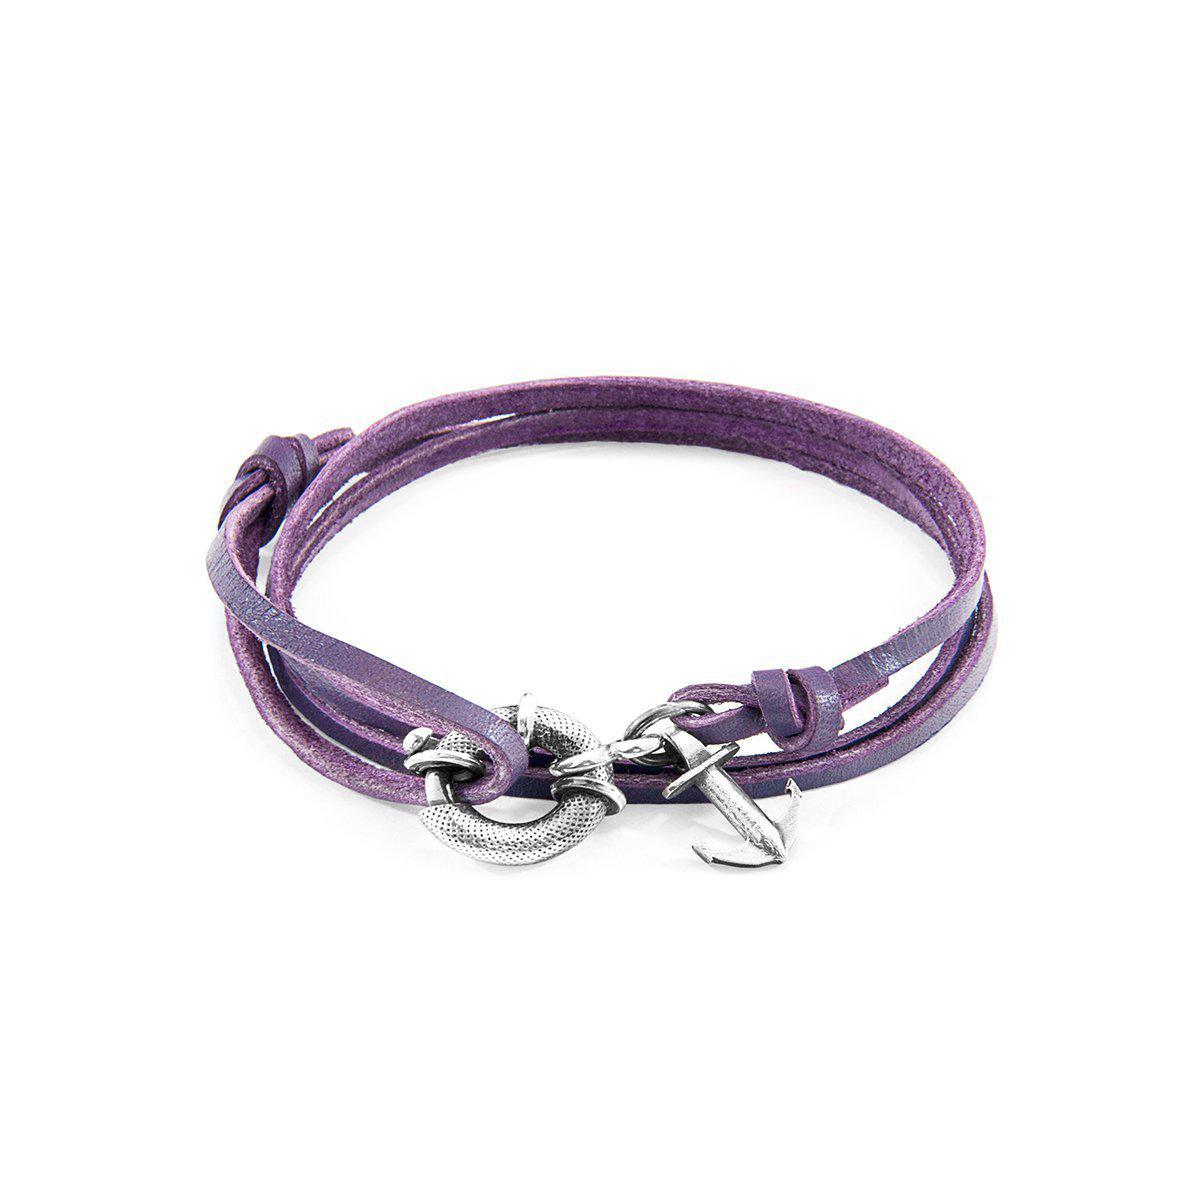 Anchor & Crew Grape Purple Clyde Silver and Leather Bracelet Fj3GDN